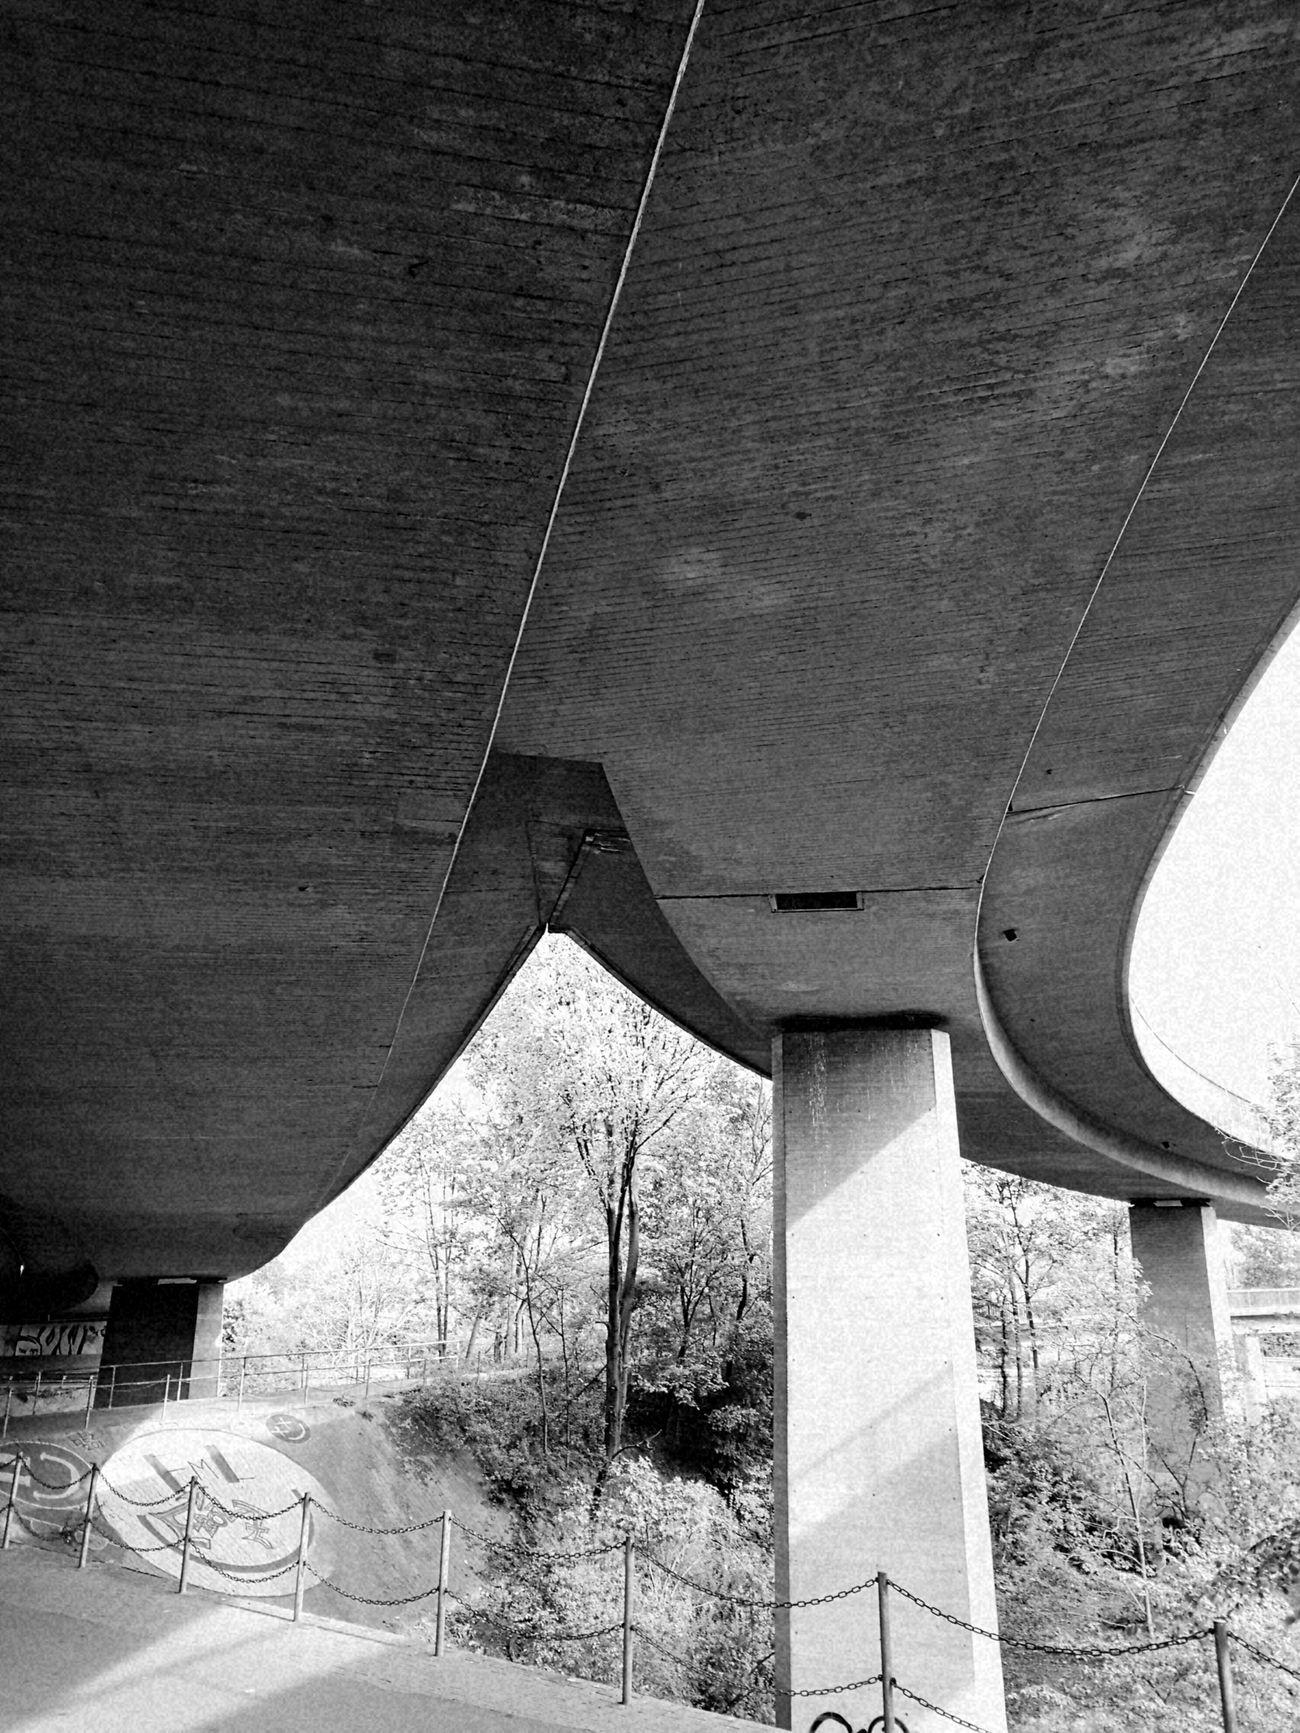 Lächeln Grau Frühling Grey Art Is Everywhere Smile Neckar Kunst Ist Was Du Daraus Machst Unheimlich Allone  The Secret Spaces The Street Photographer - 2017 EyeEm Awards